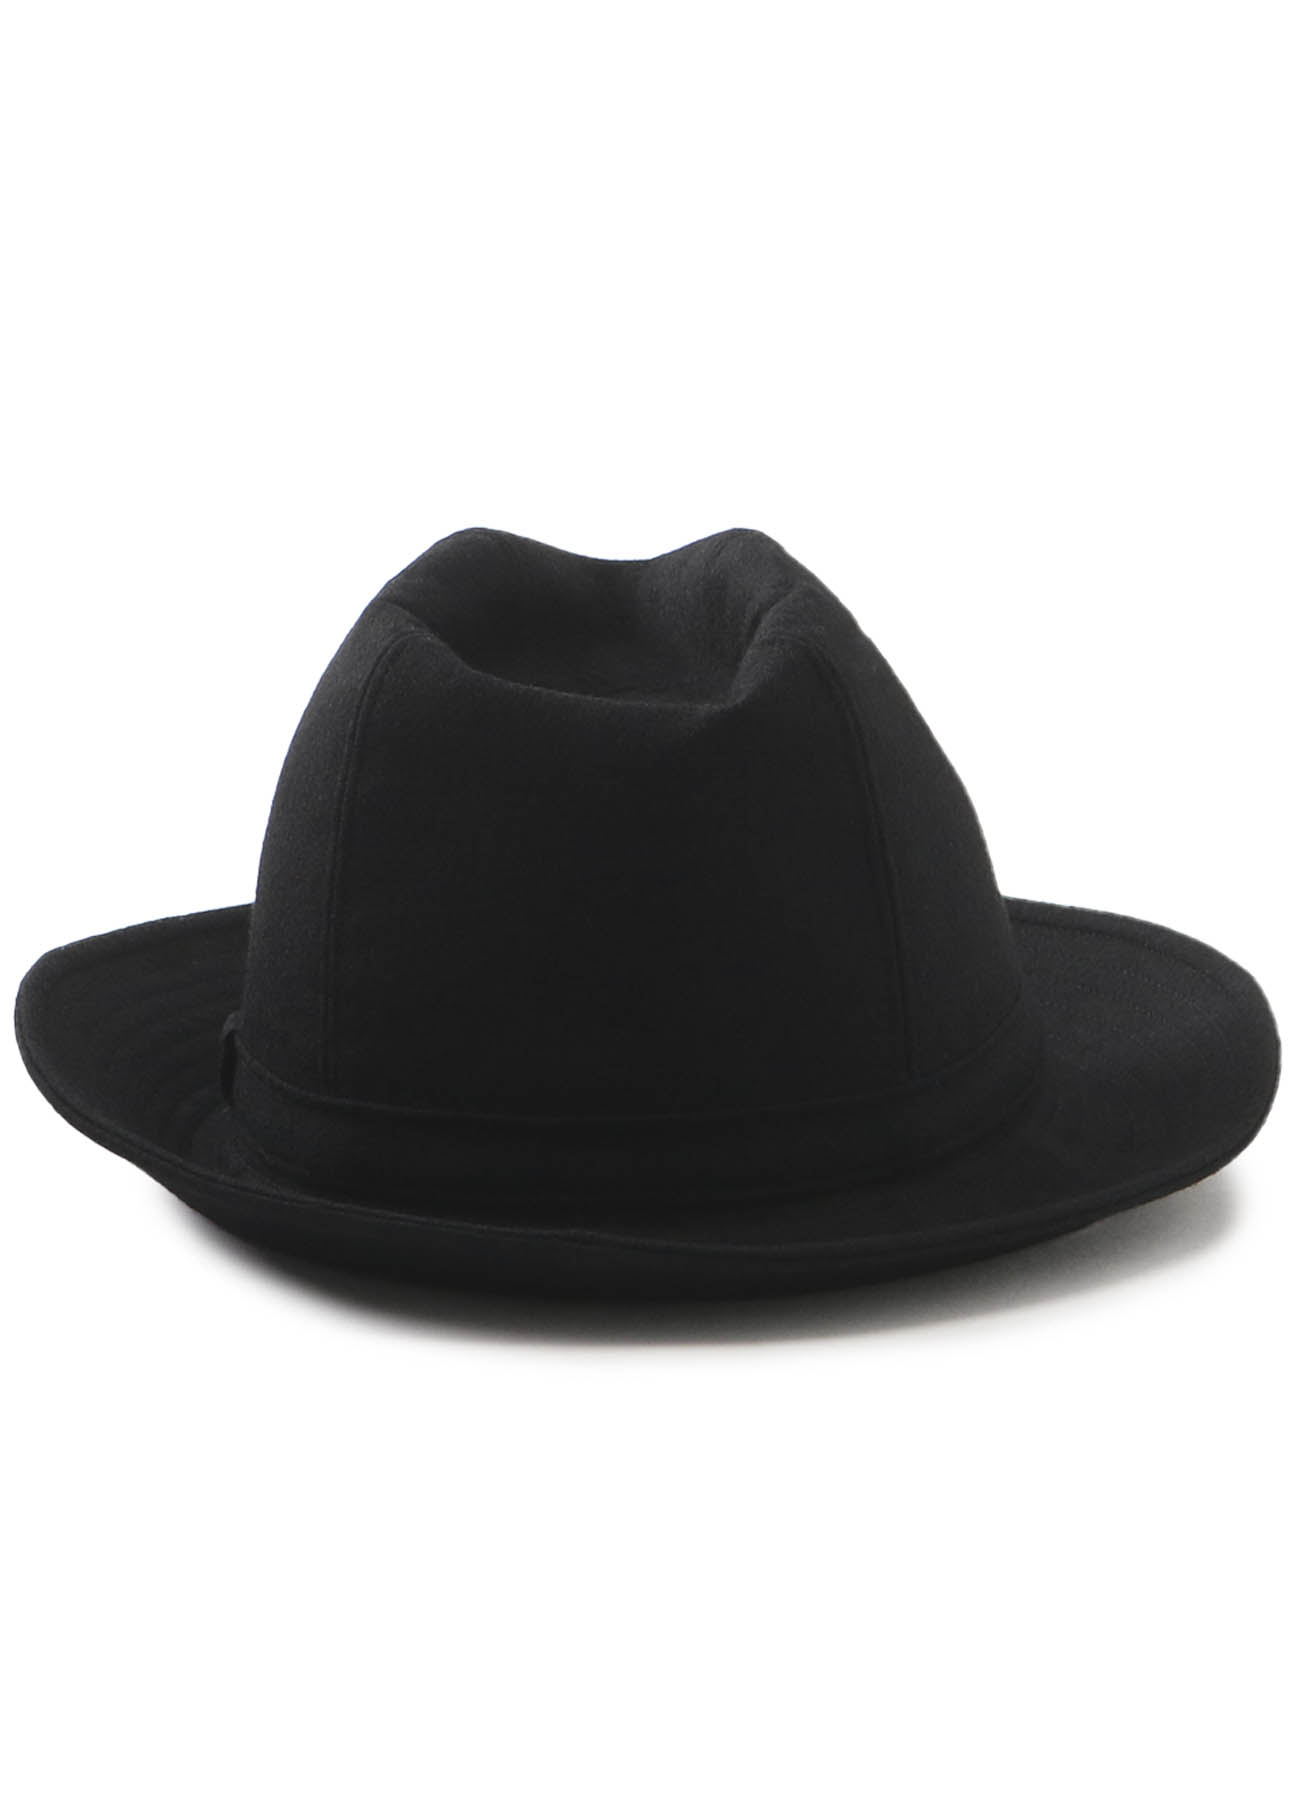 2/60 SERGE MILLED FEDORA HAT